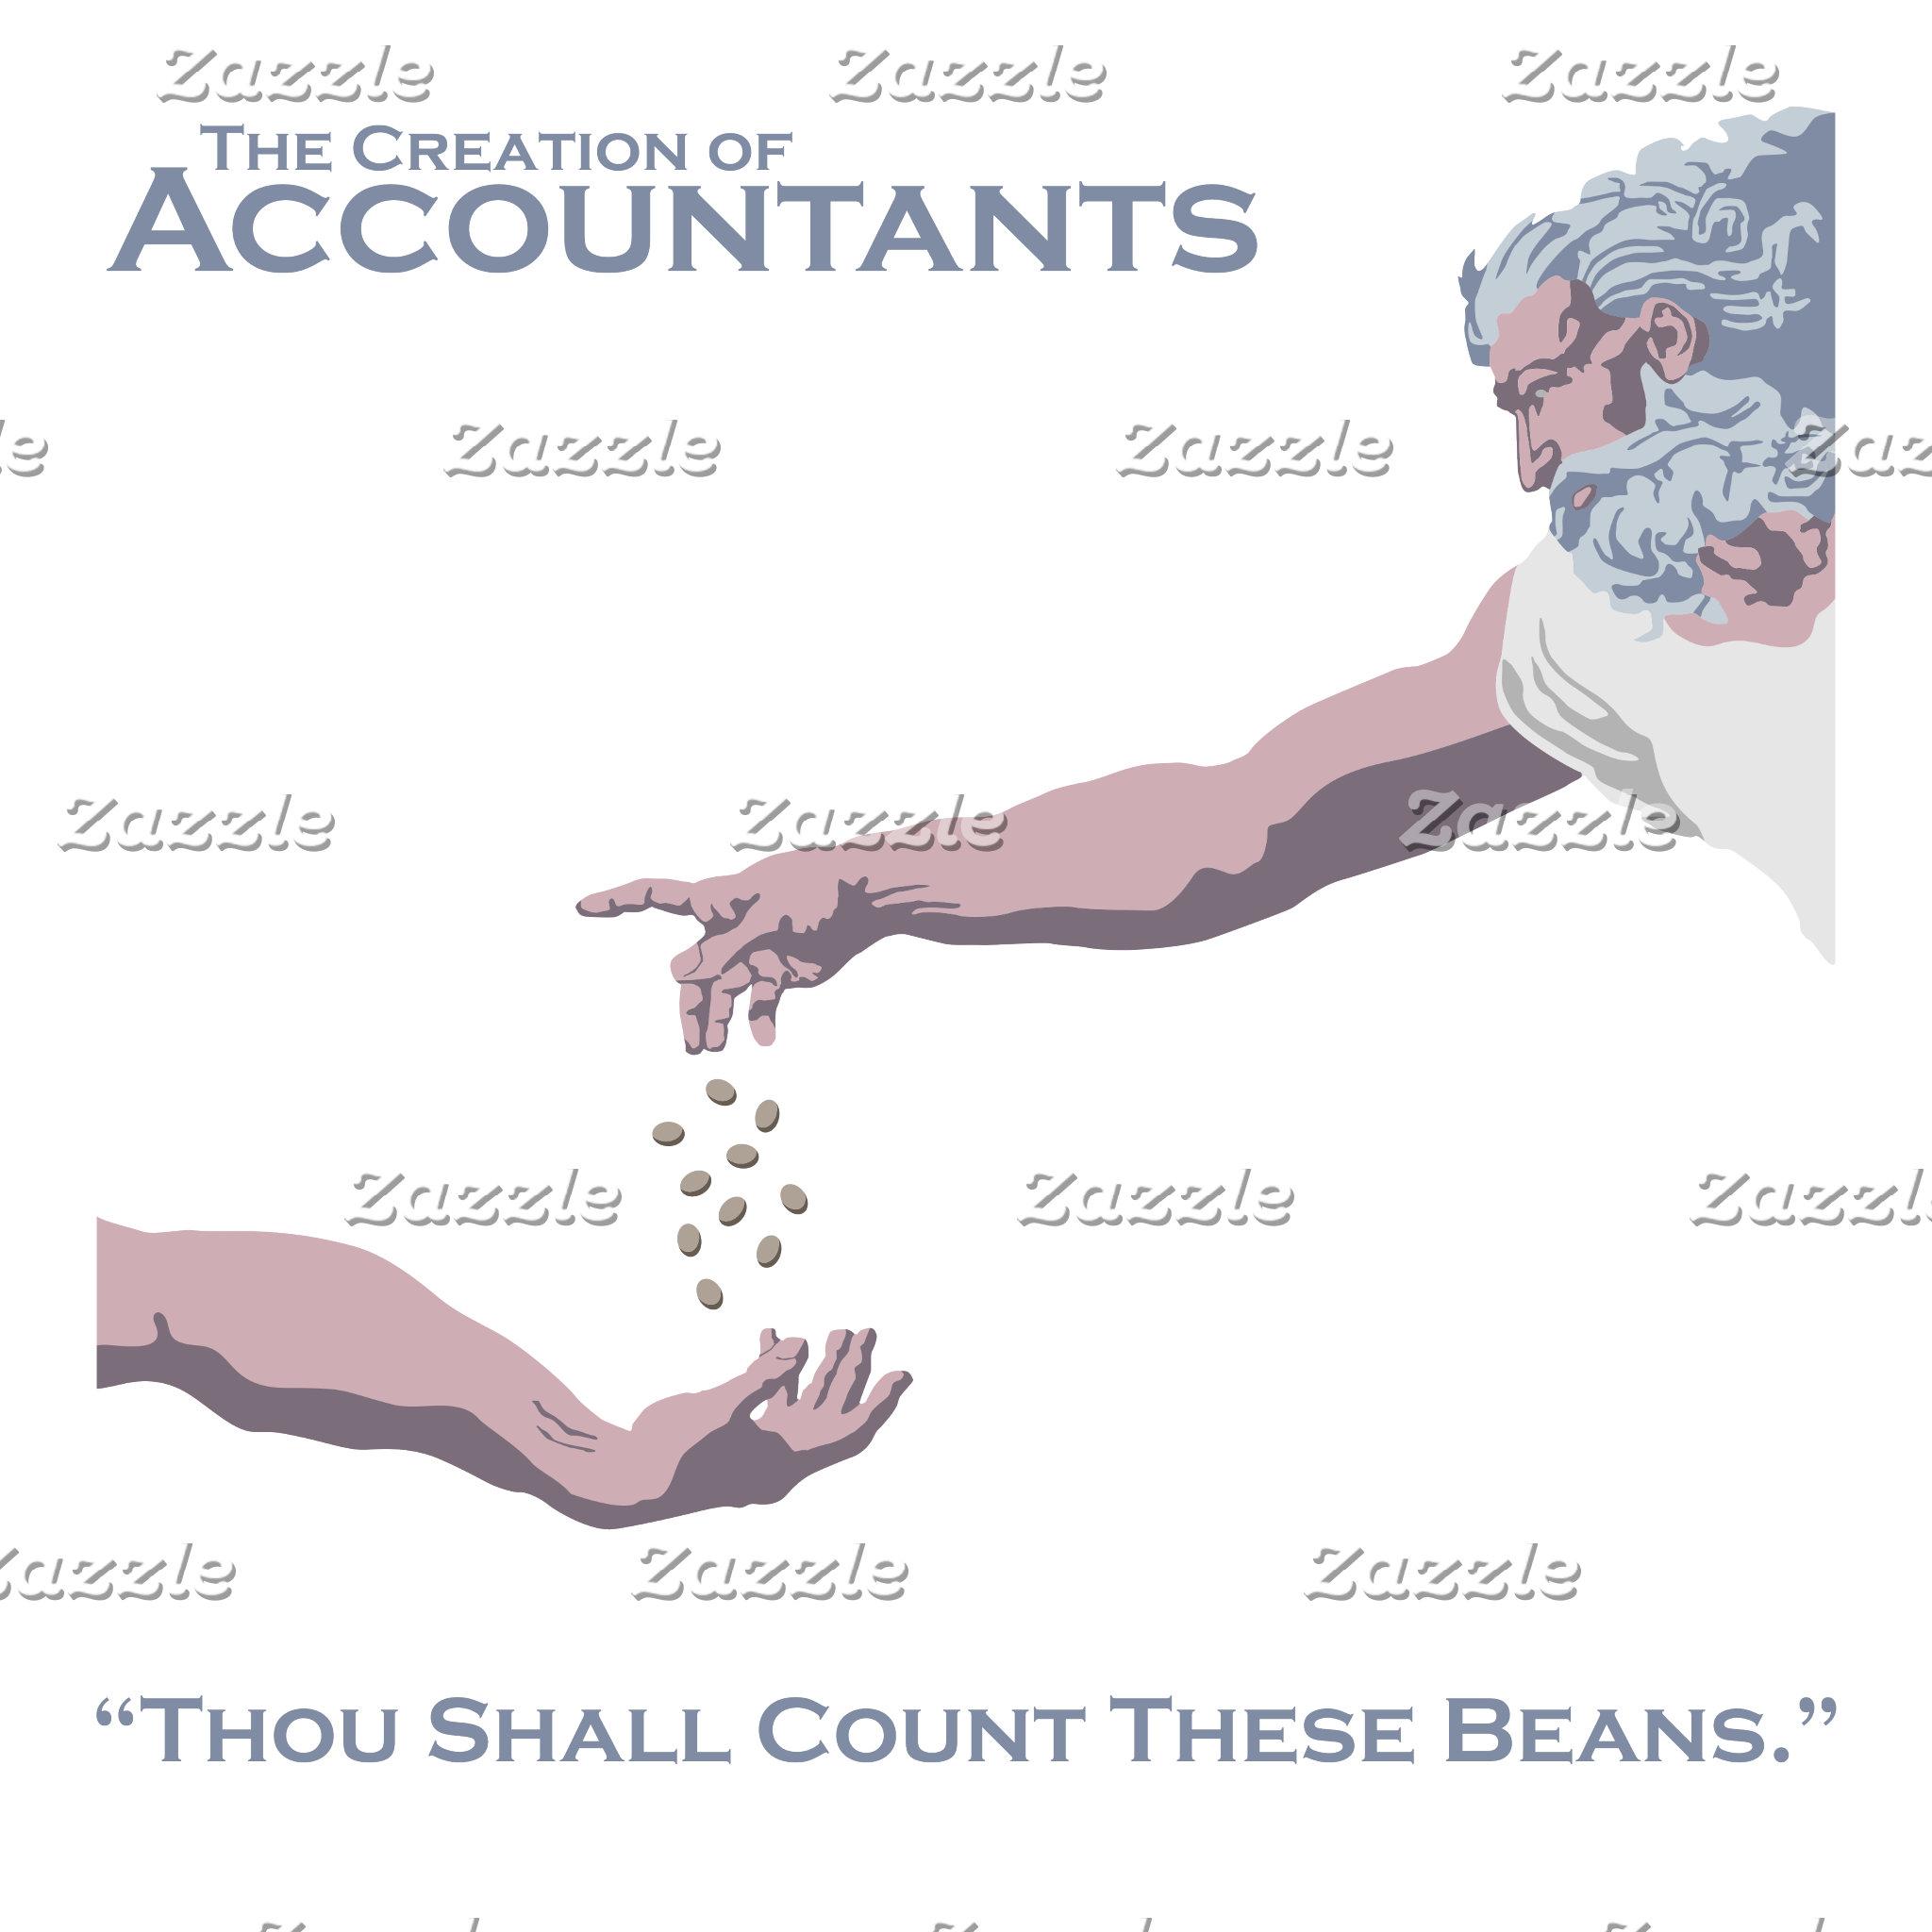 The Creation of Accountants